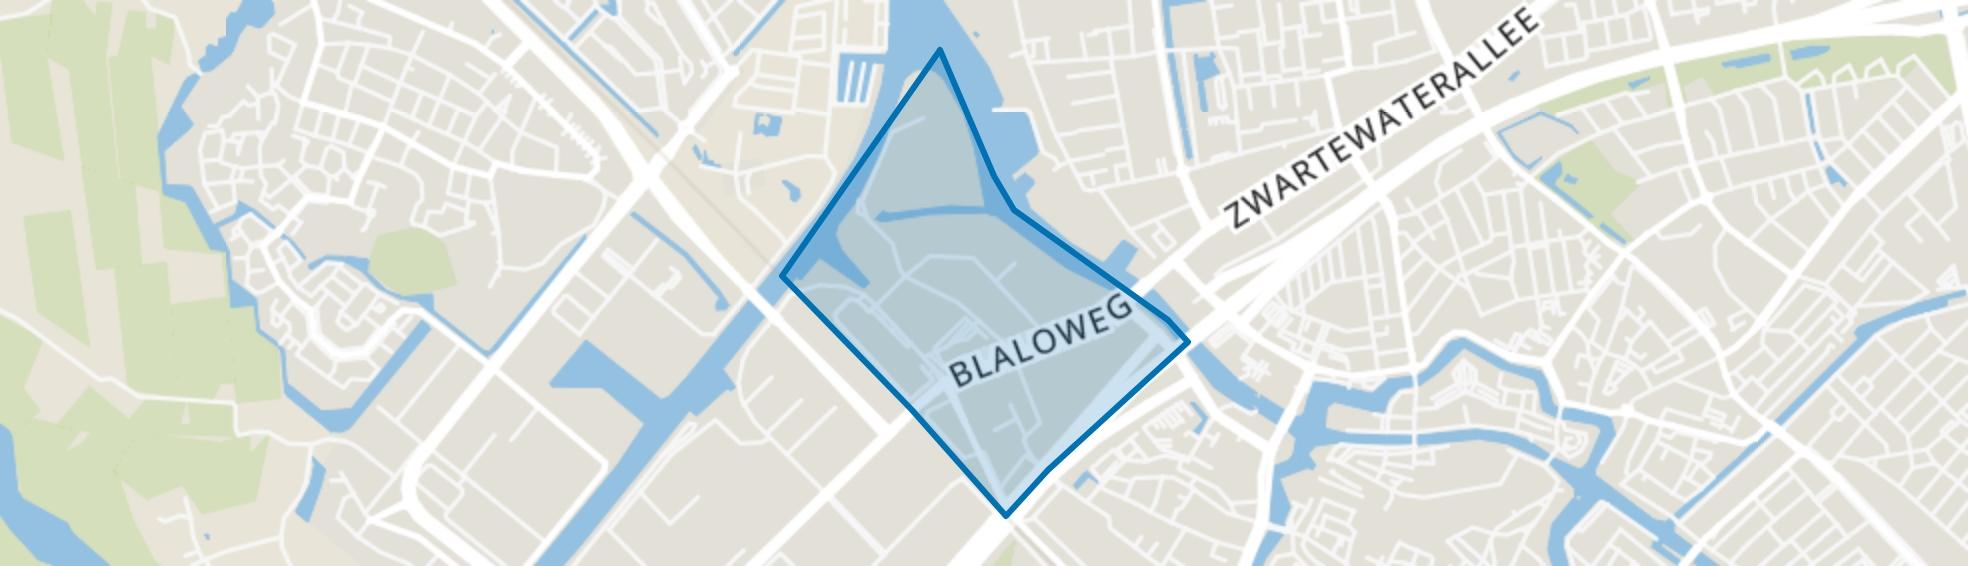 Bedrijventerrein Voorst-A, Zwolle map